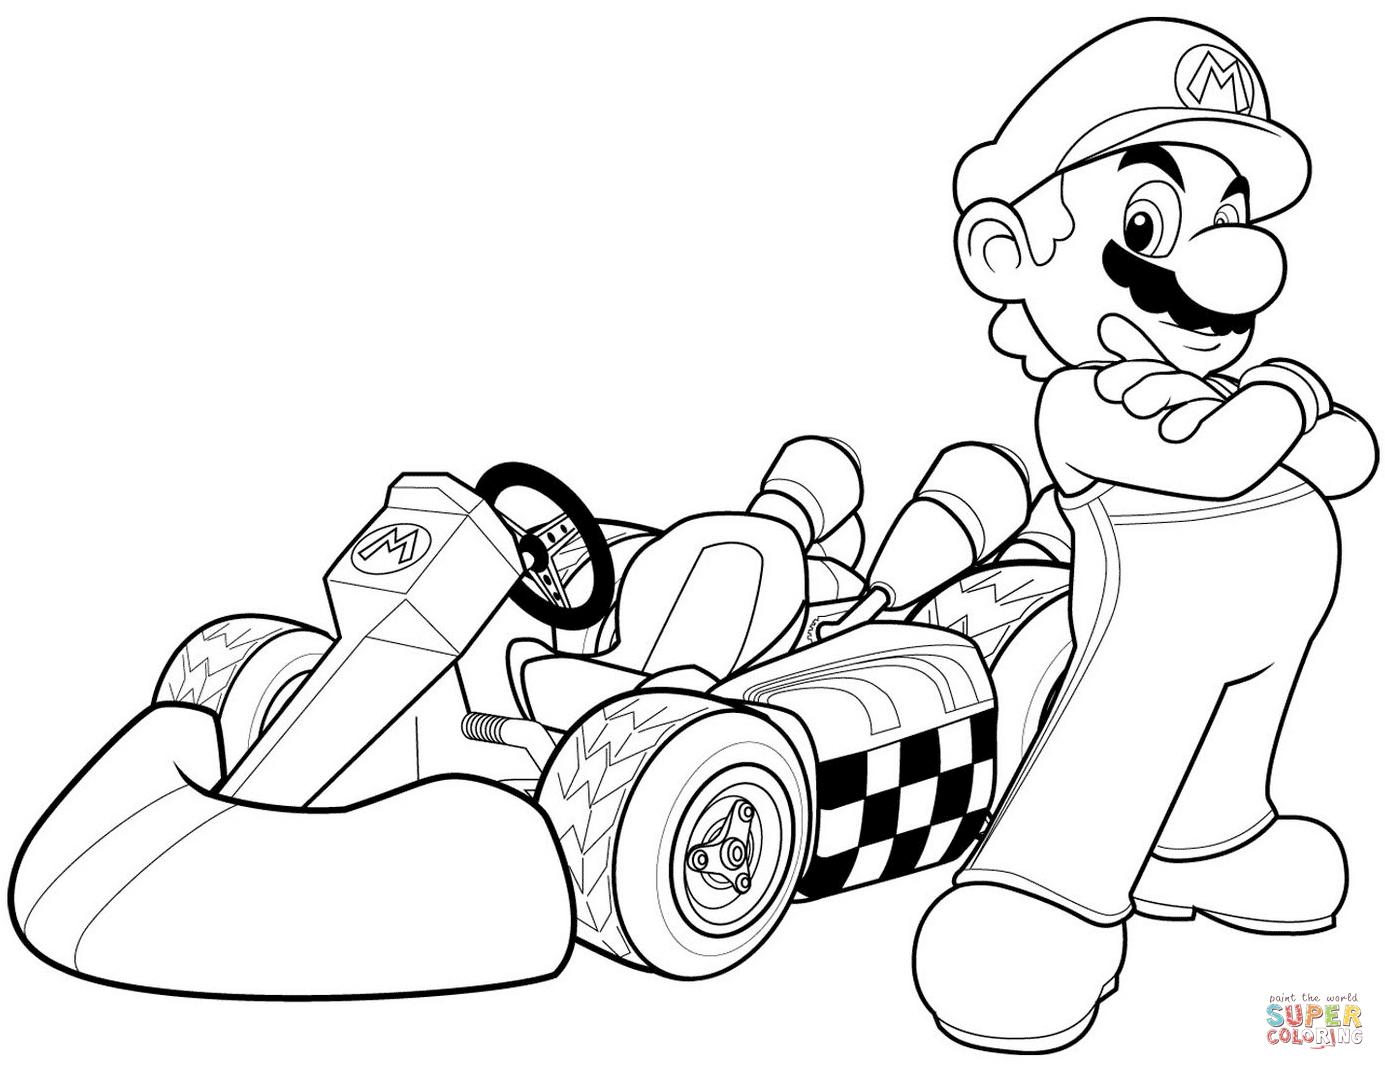 Super Mario Bros. Coloring Pages   Free Coloring Pages - Mario Coloring Pages Free Printable